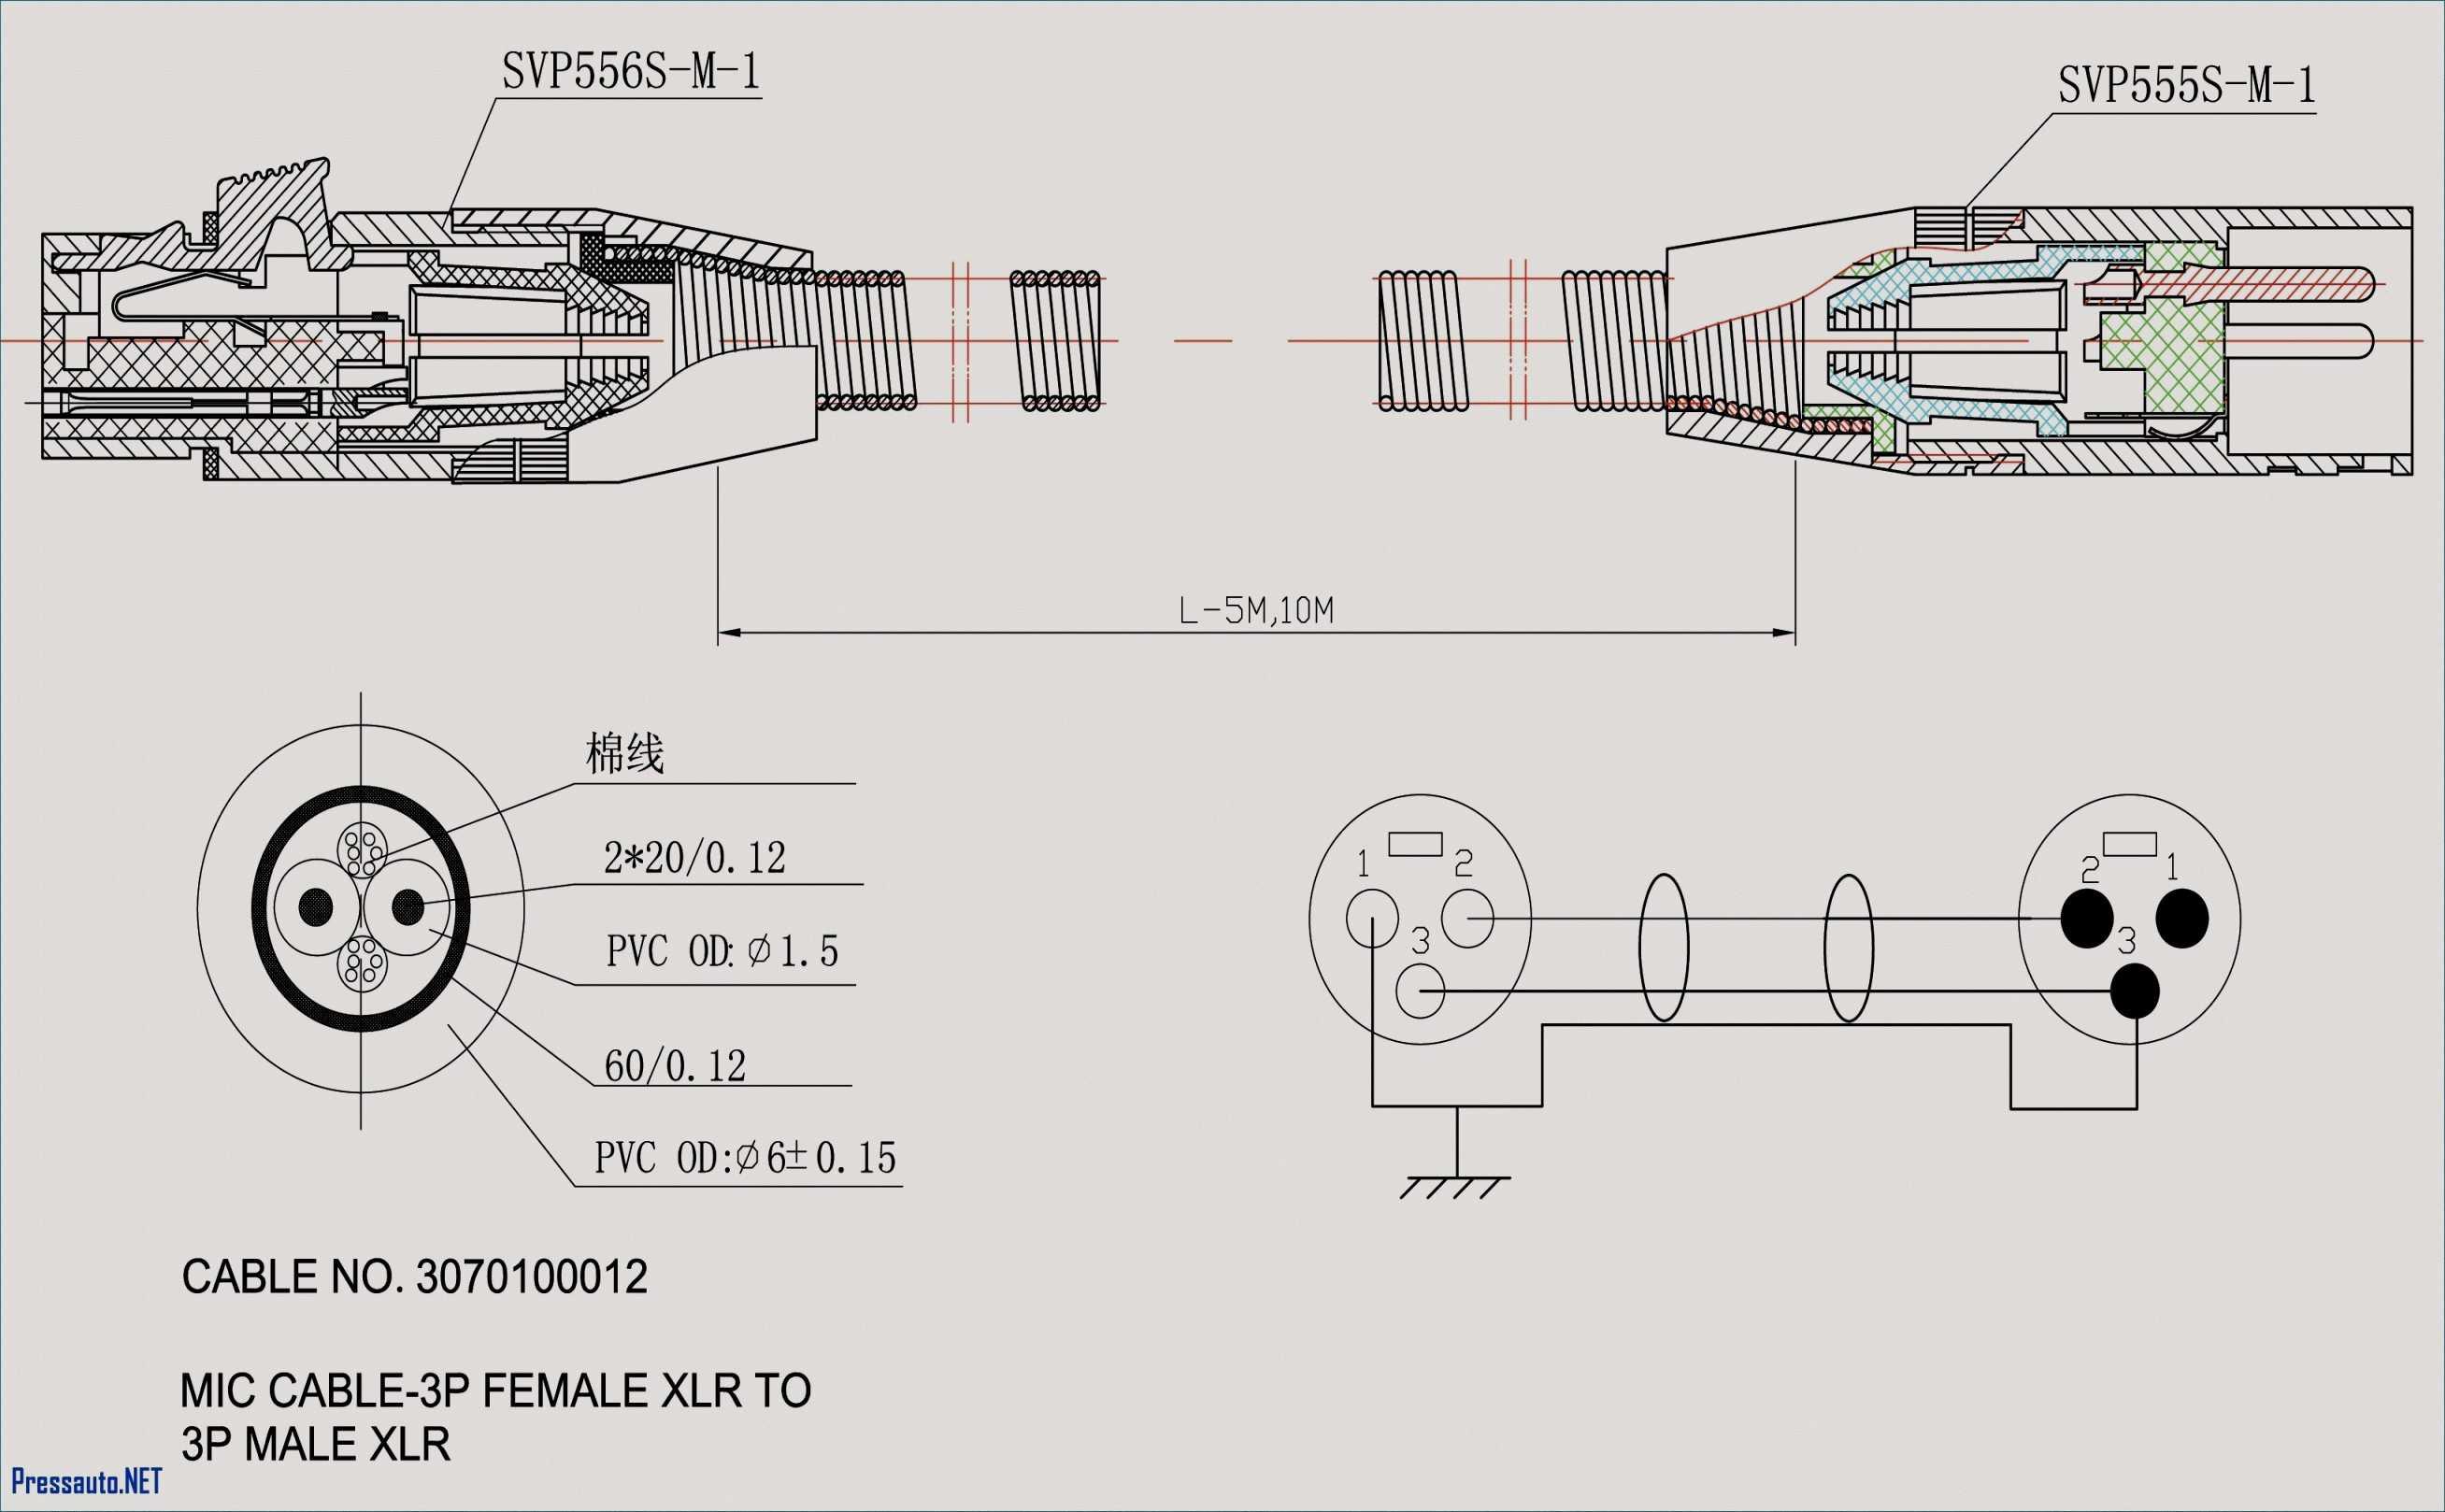 Delco Remy Starter Wiring Diagram - Wiring Diagrams - Delco Remy Alternator Wiring Diagram